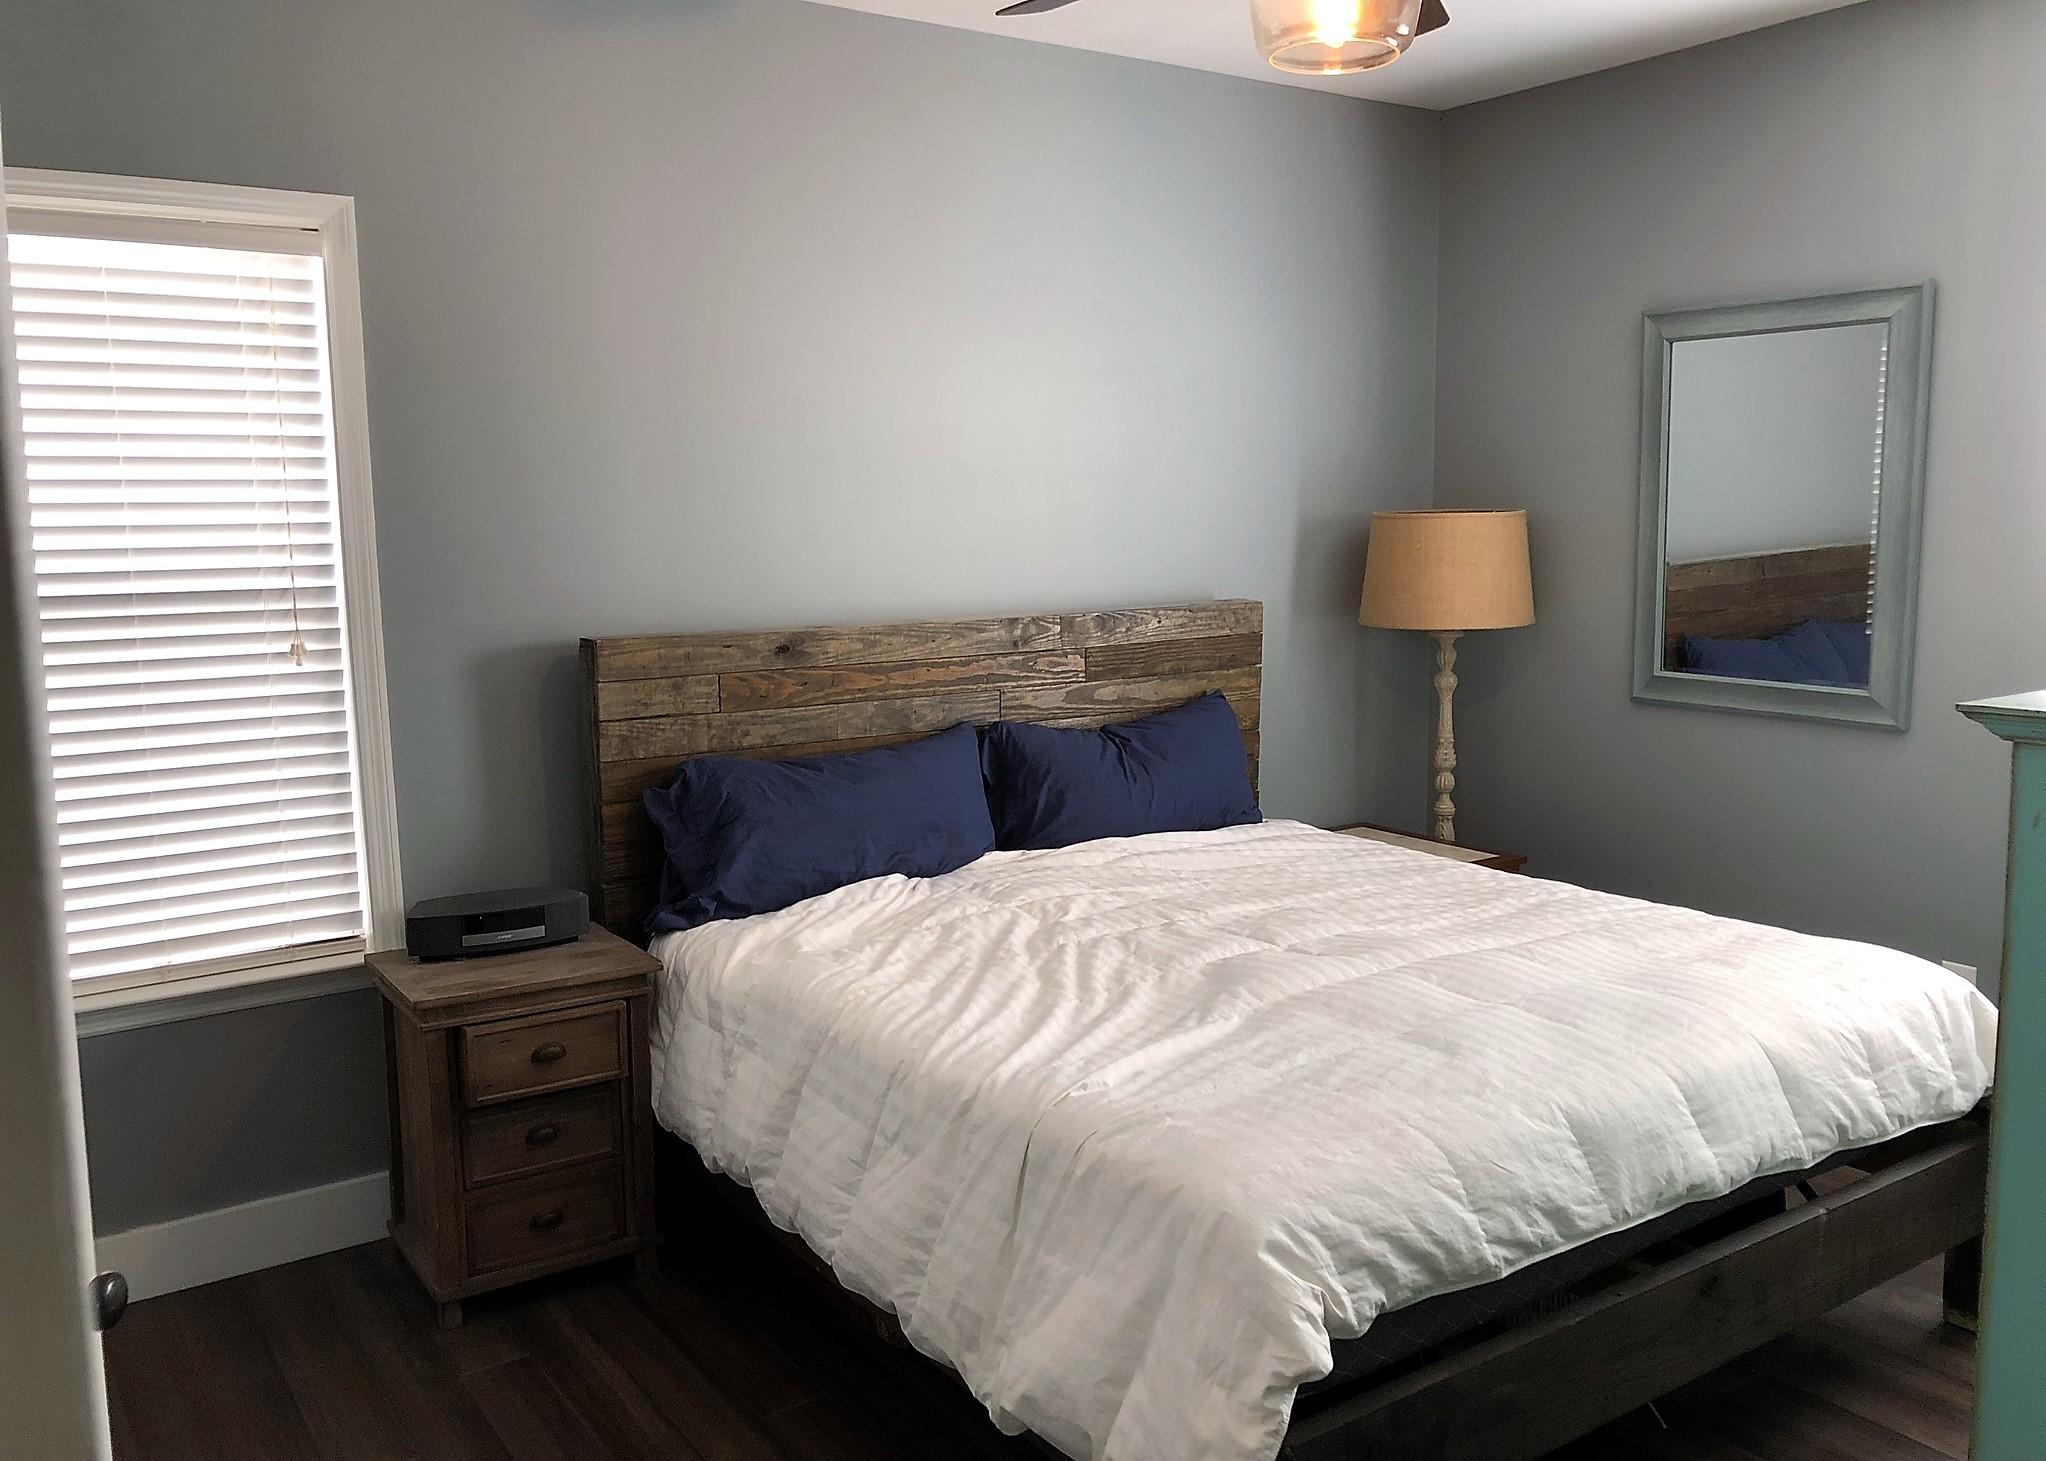 Fairway Villas Homes For Sale - 1542 Little Rock, Charleston, SC - 14